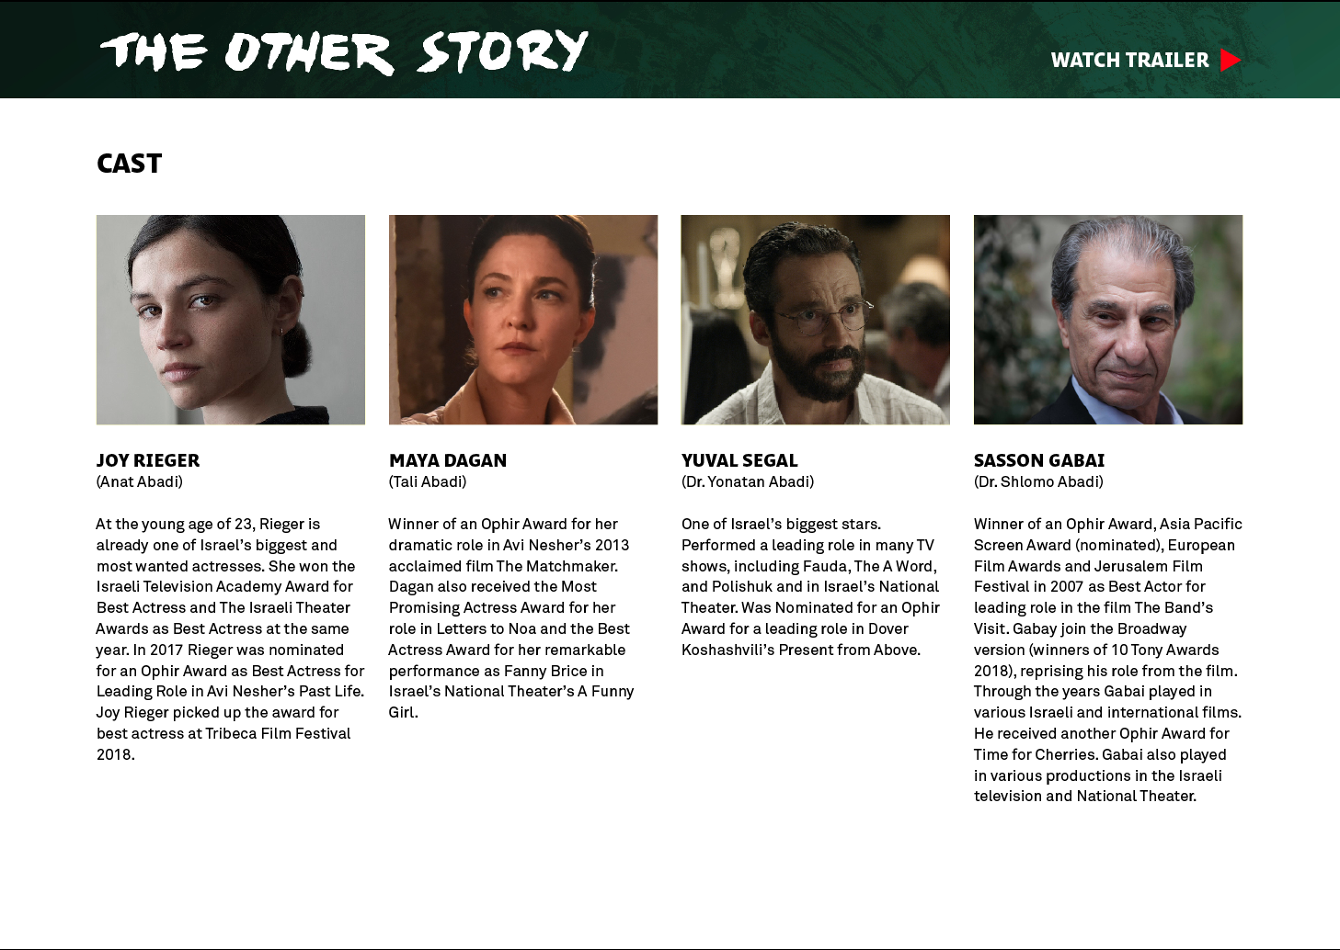 The Other Story by Avi Nesher - RRNR studio